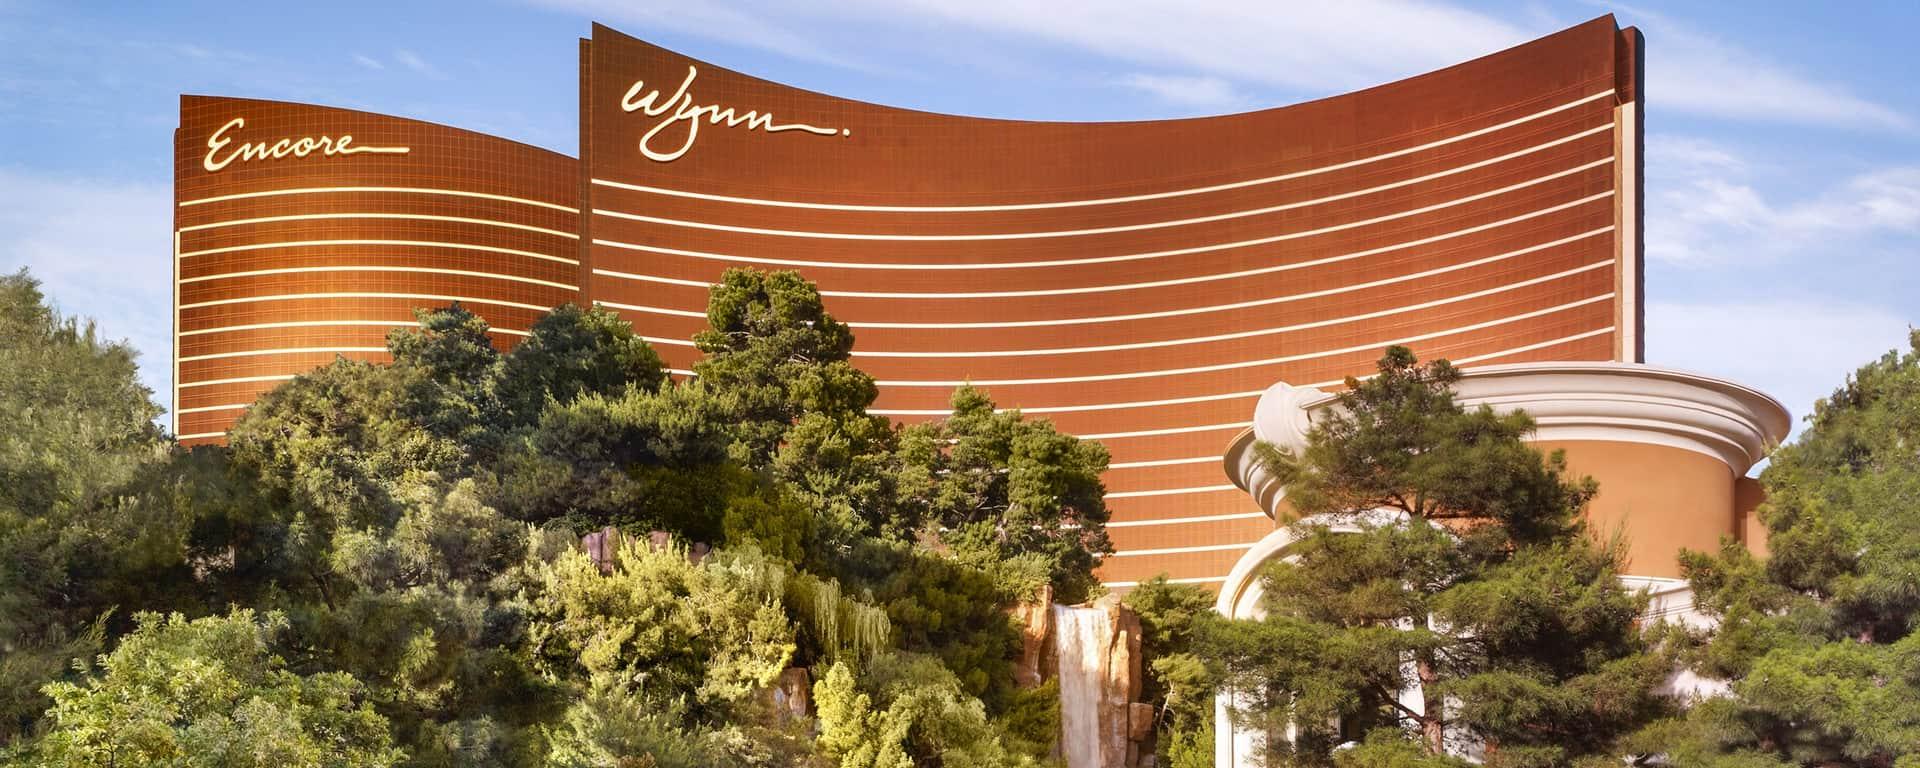 Casino Wynn Las Vegas